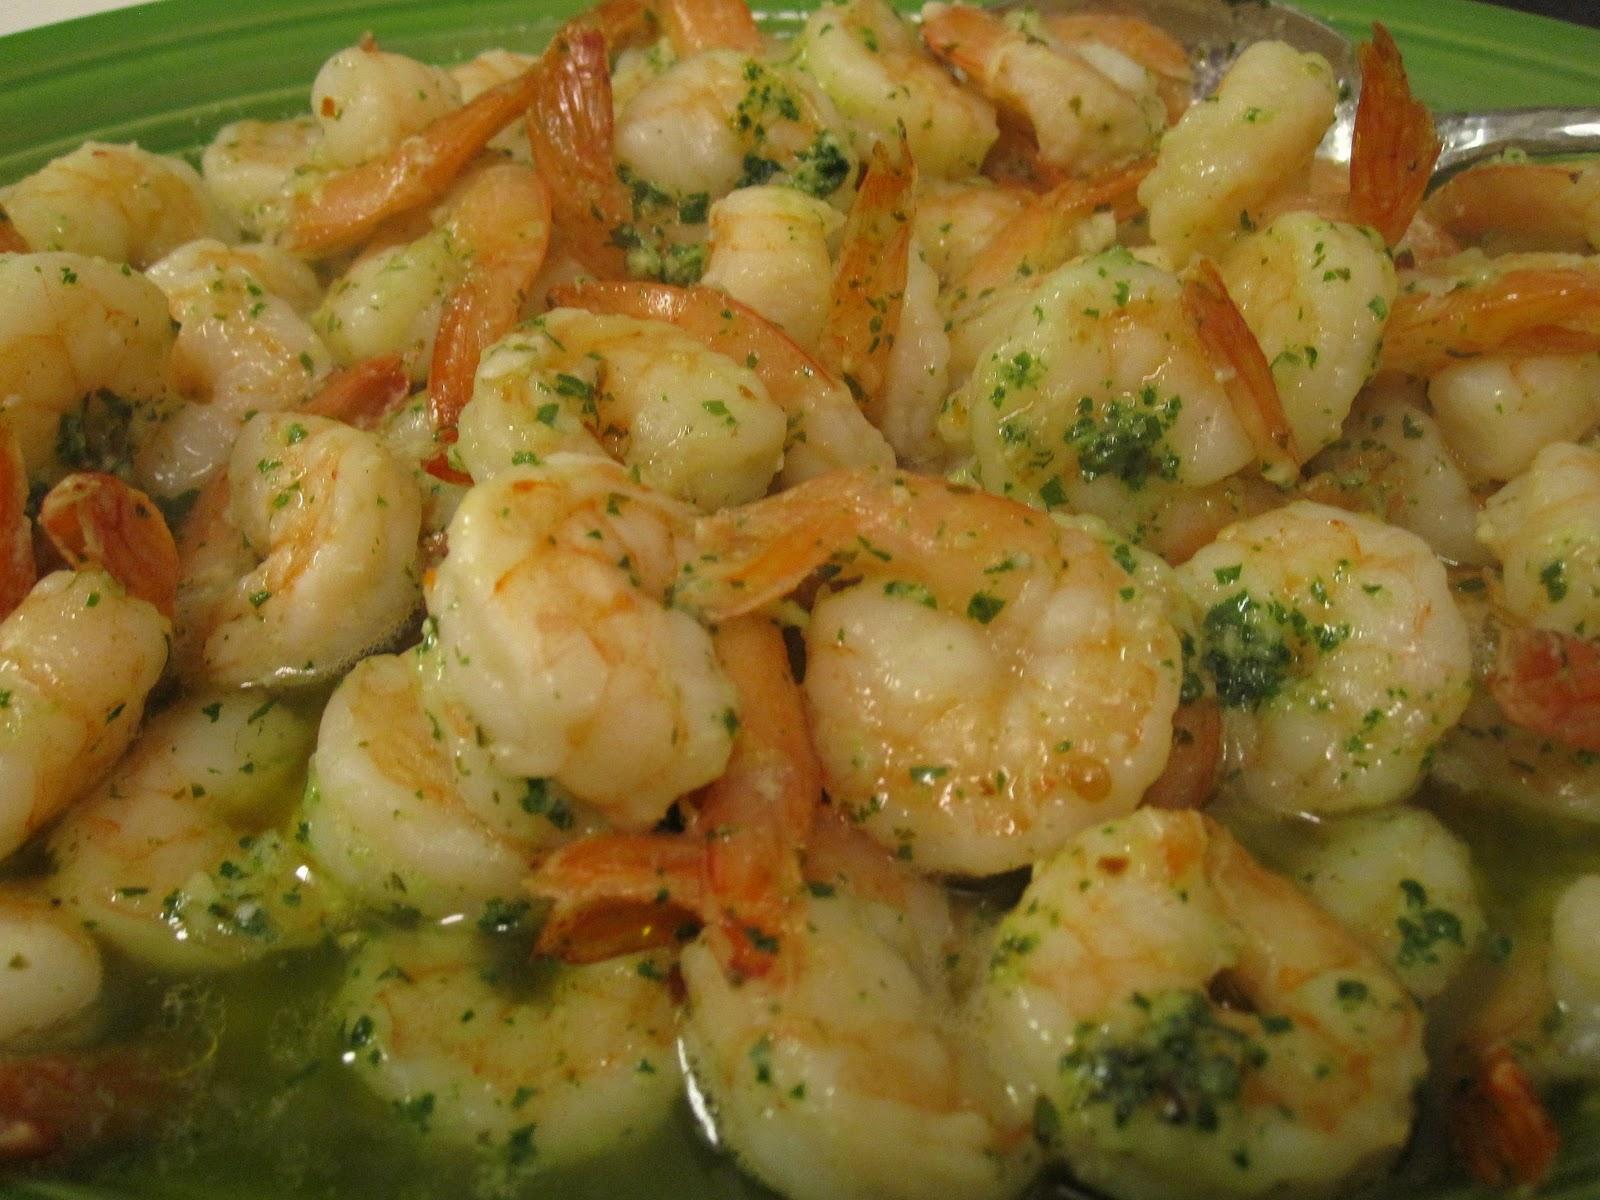 Elizabeth's Dutch Oven: Spicy Lemon Garlic Shrimp